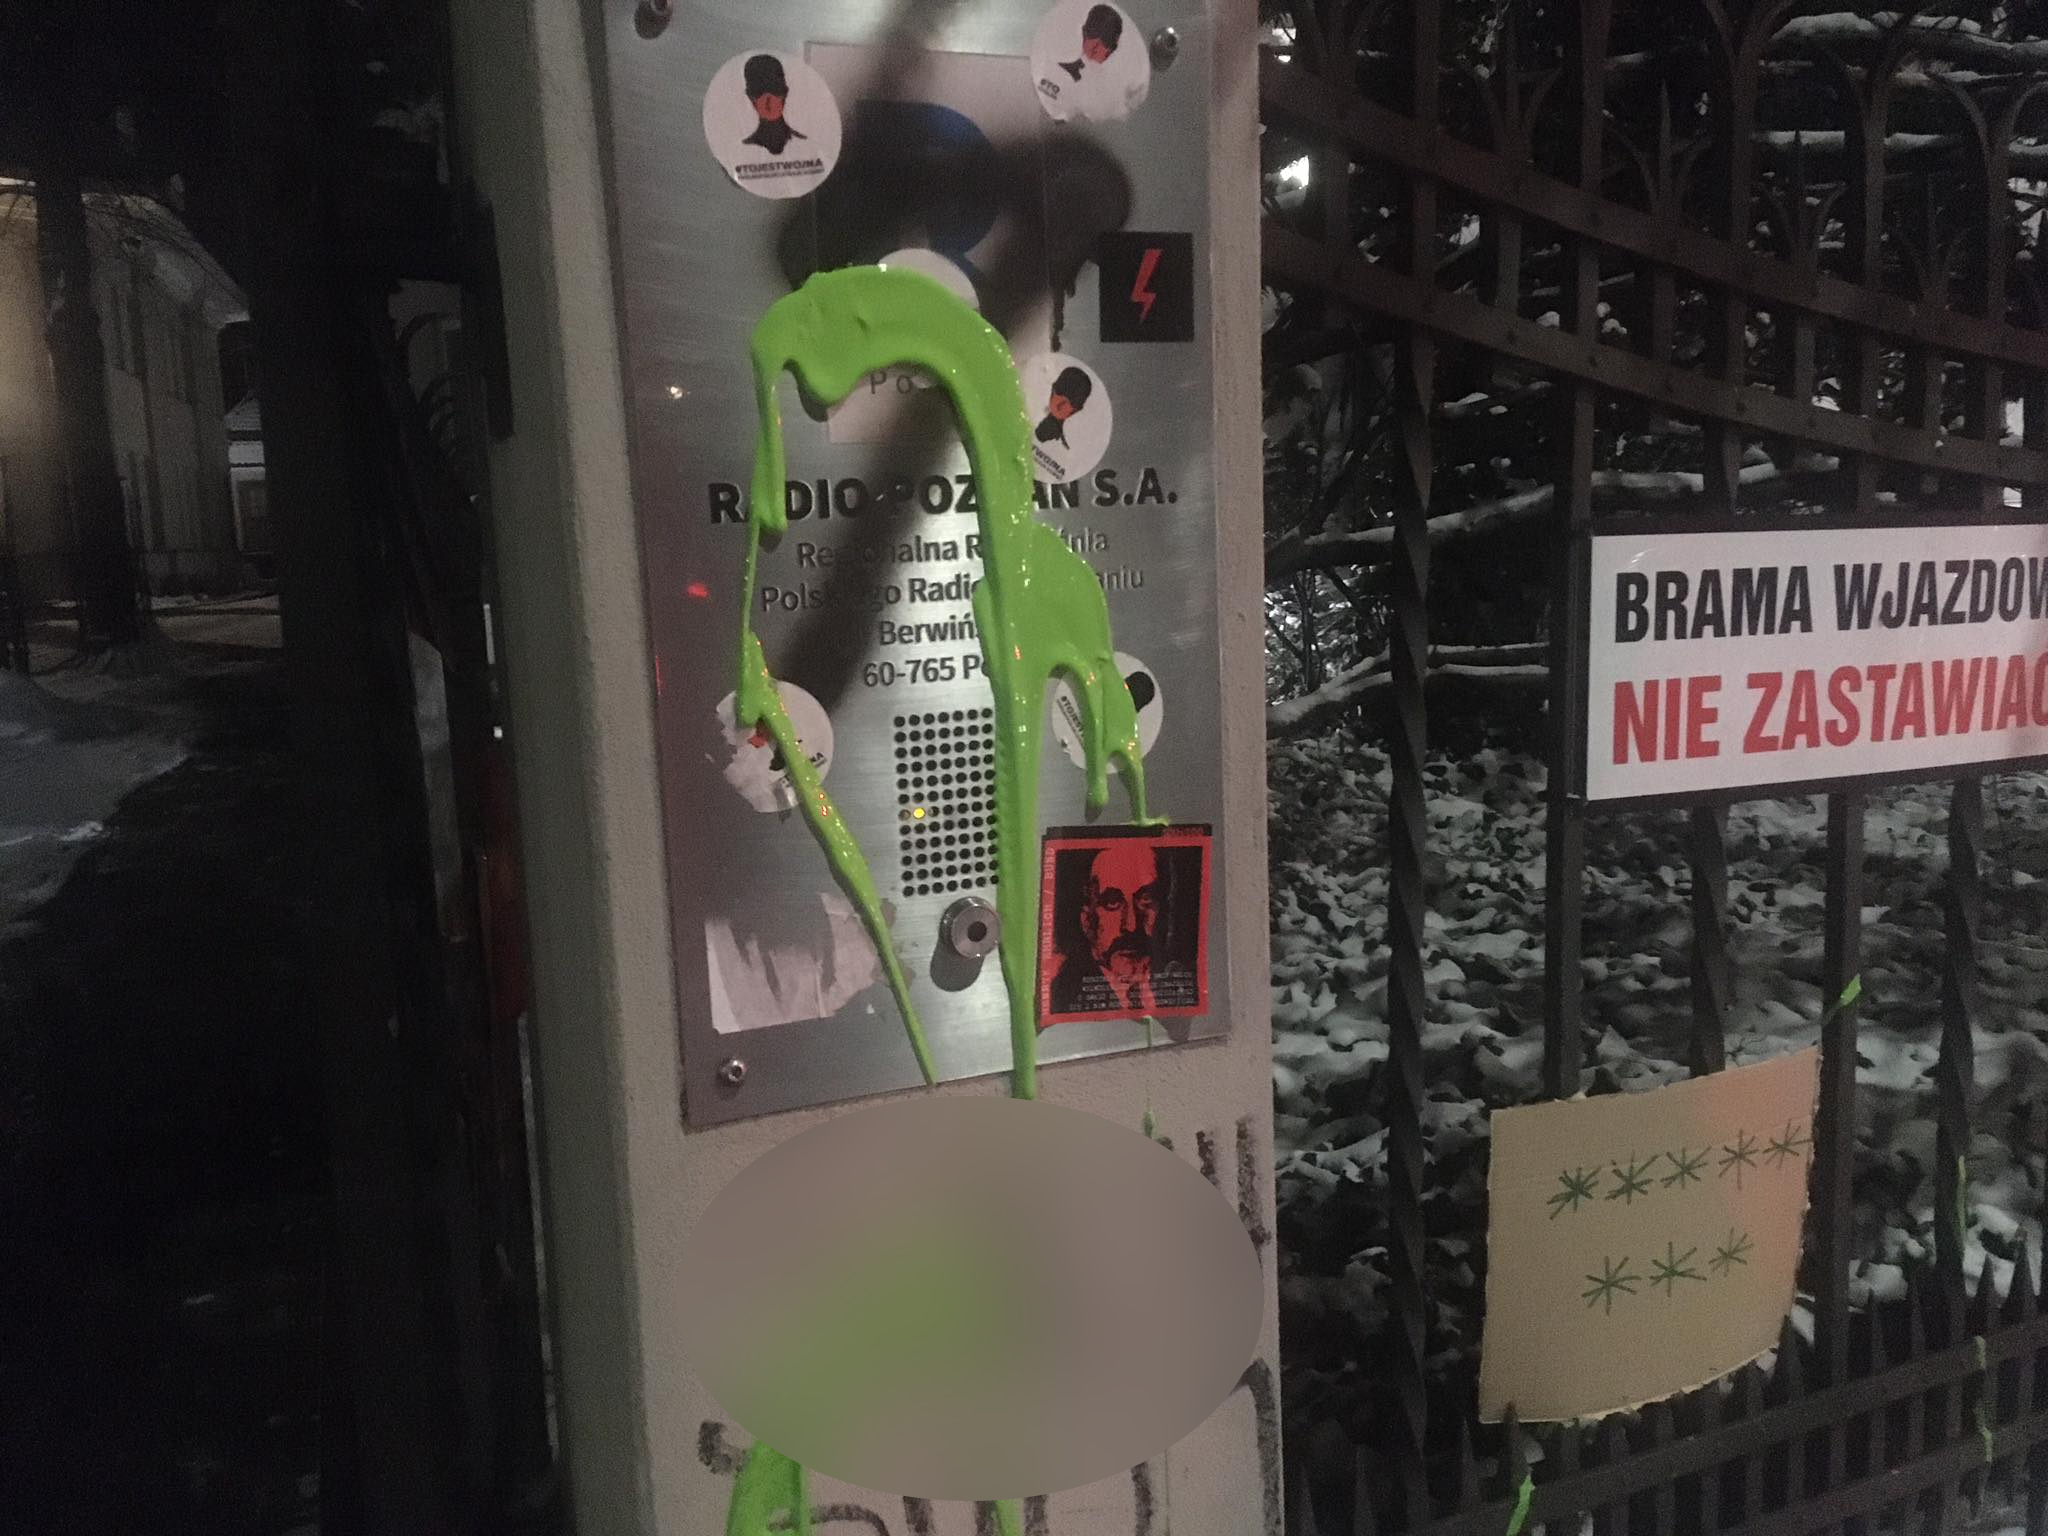 strajk kobiet atak na radio poznań - Jacek Butlewski